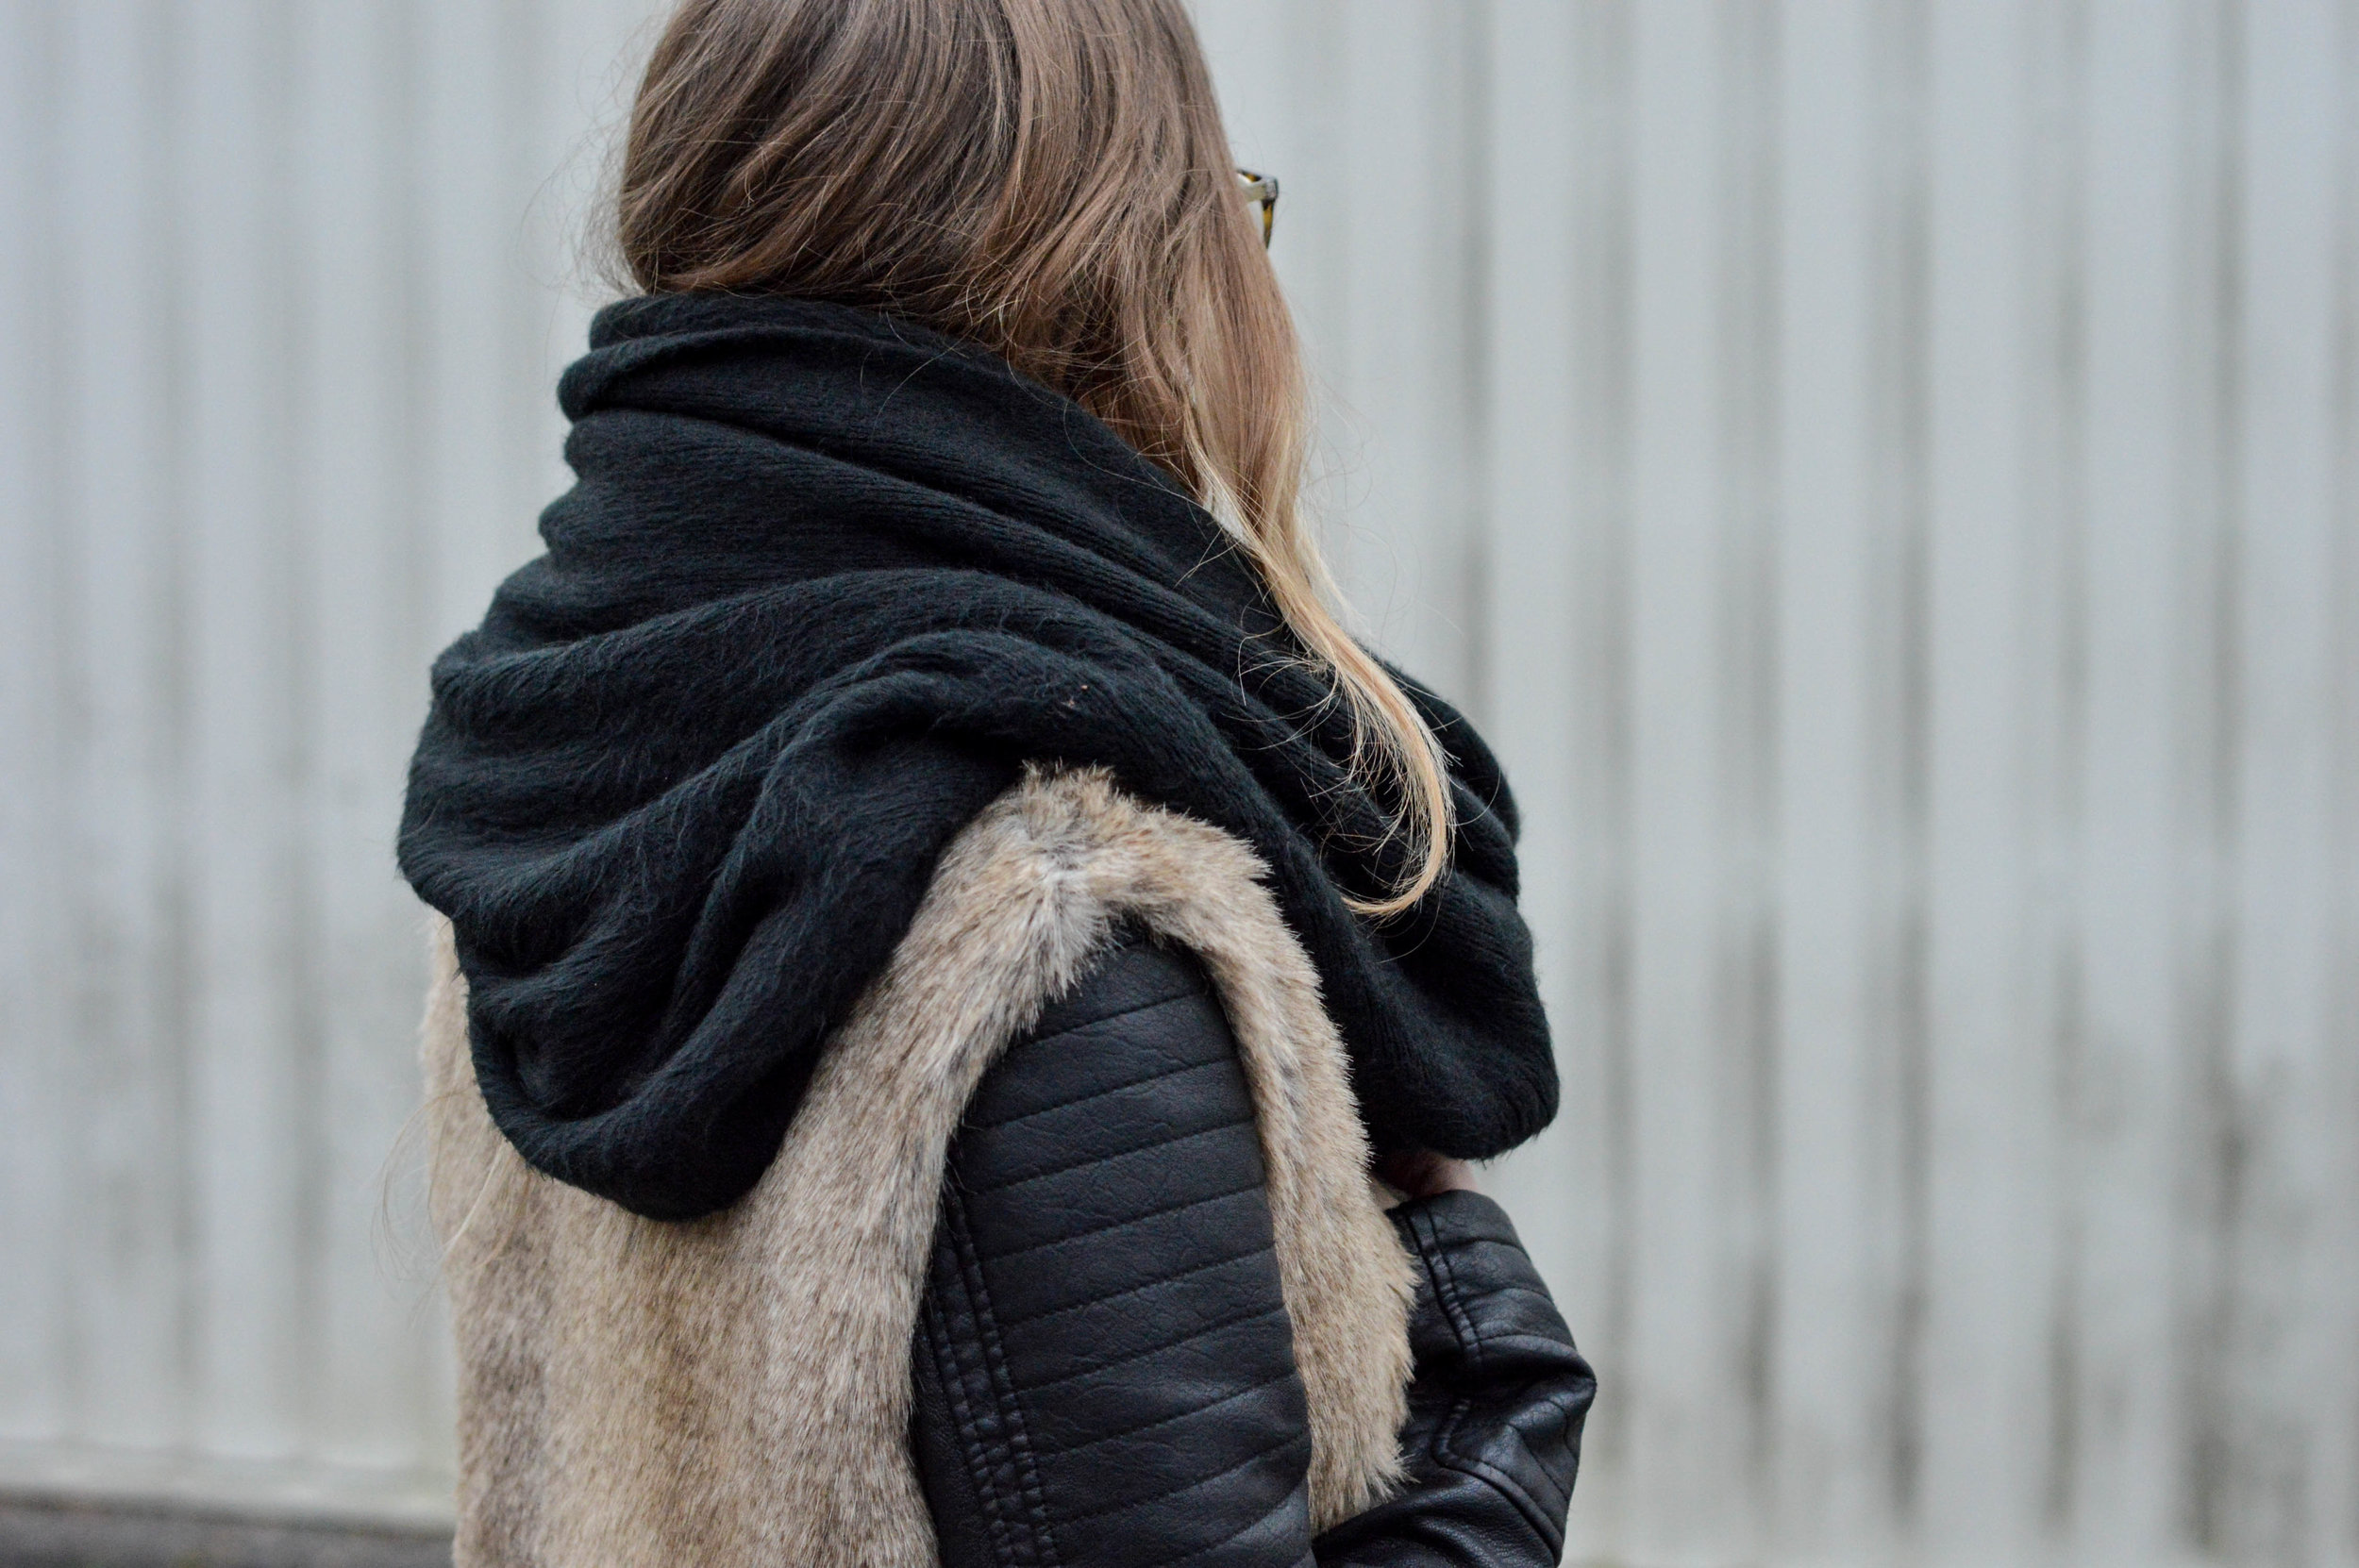 Faux Fur Jacket - OSIARAH.COM (17 of 17).jpg